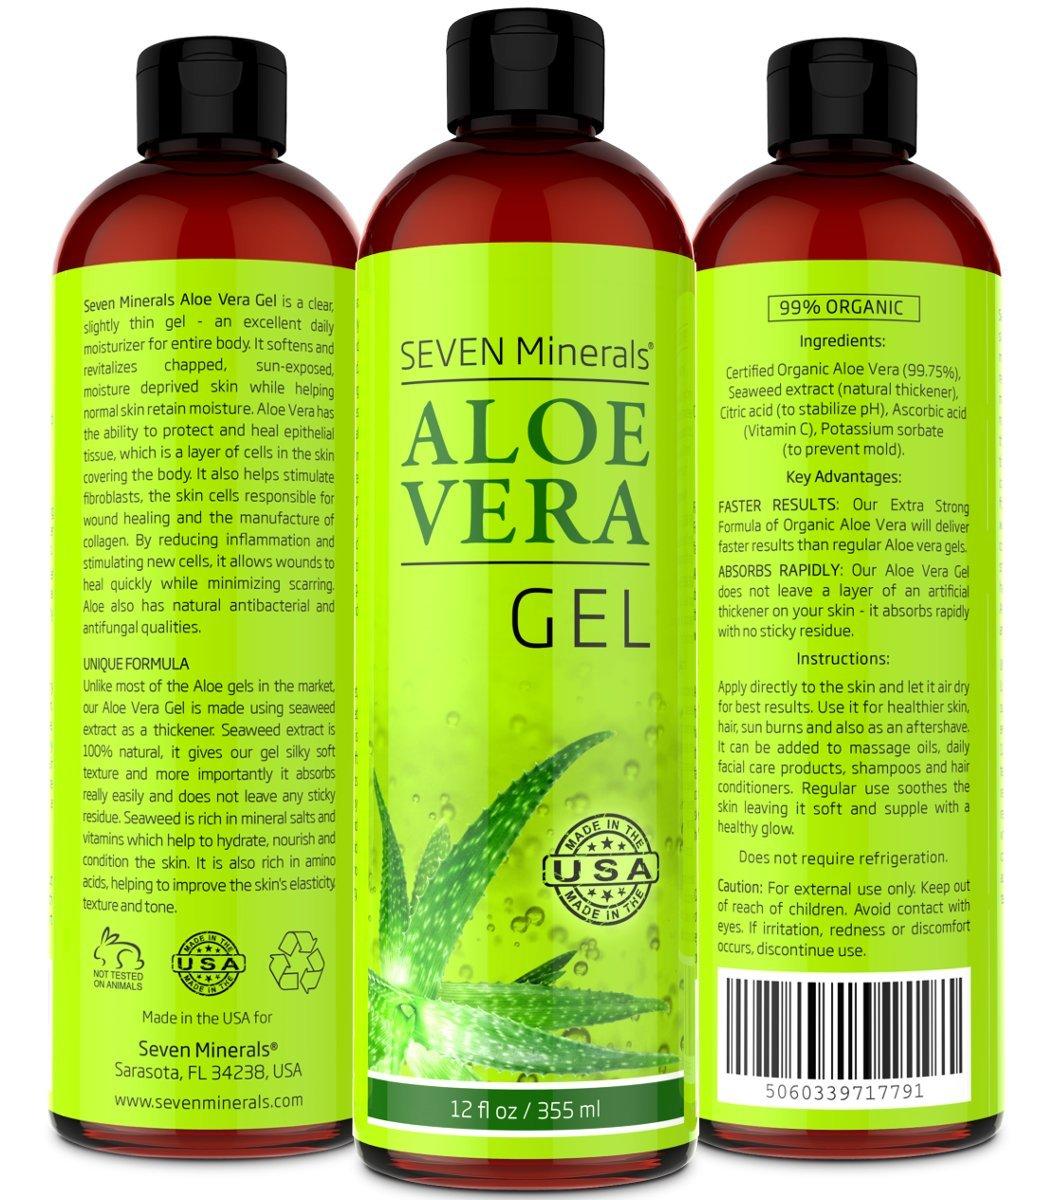 Aloe Vera Gel - 99% Organic 12 Oz - No Xanthan So It Absorbs Rapidly With No.. 8